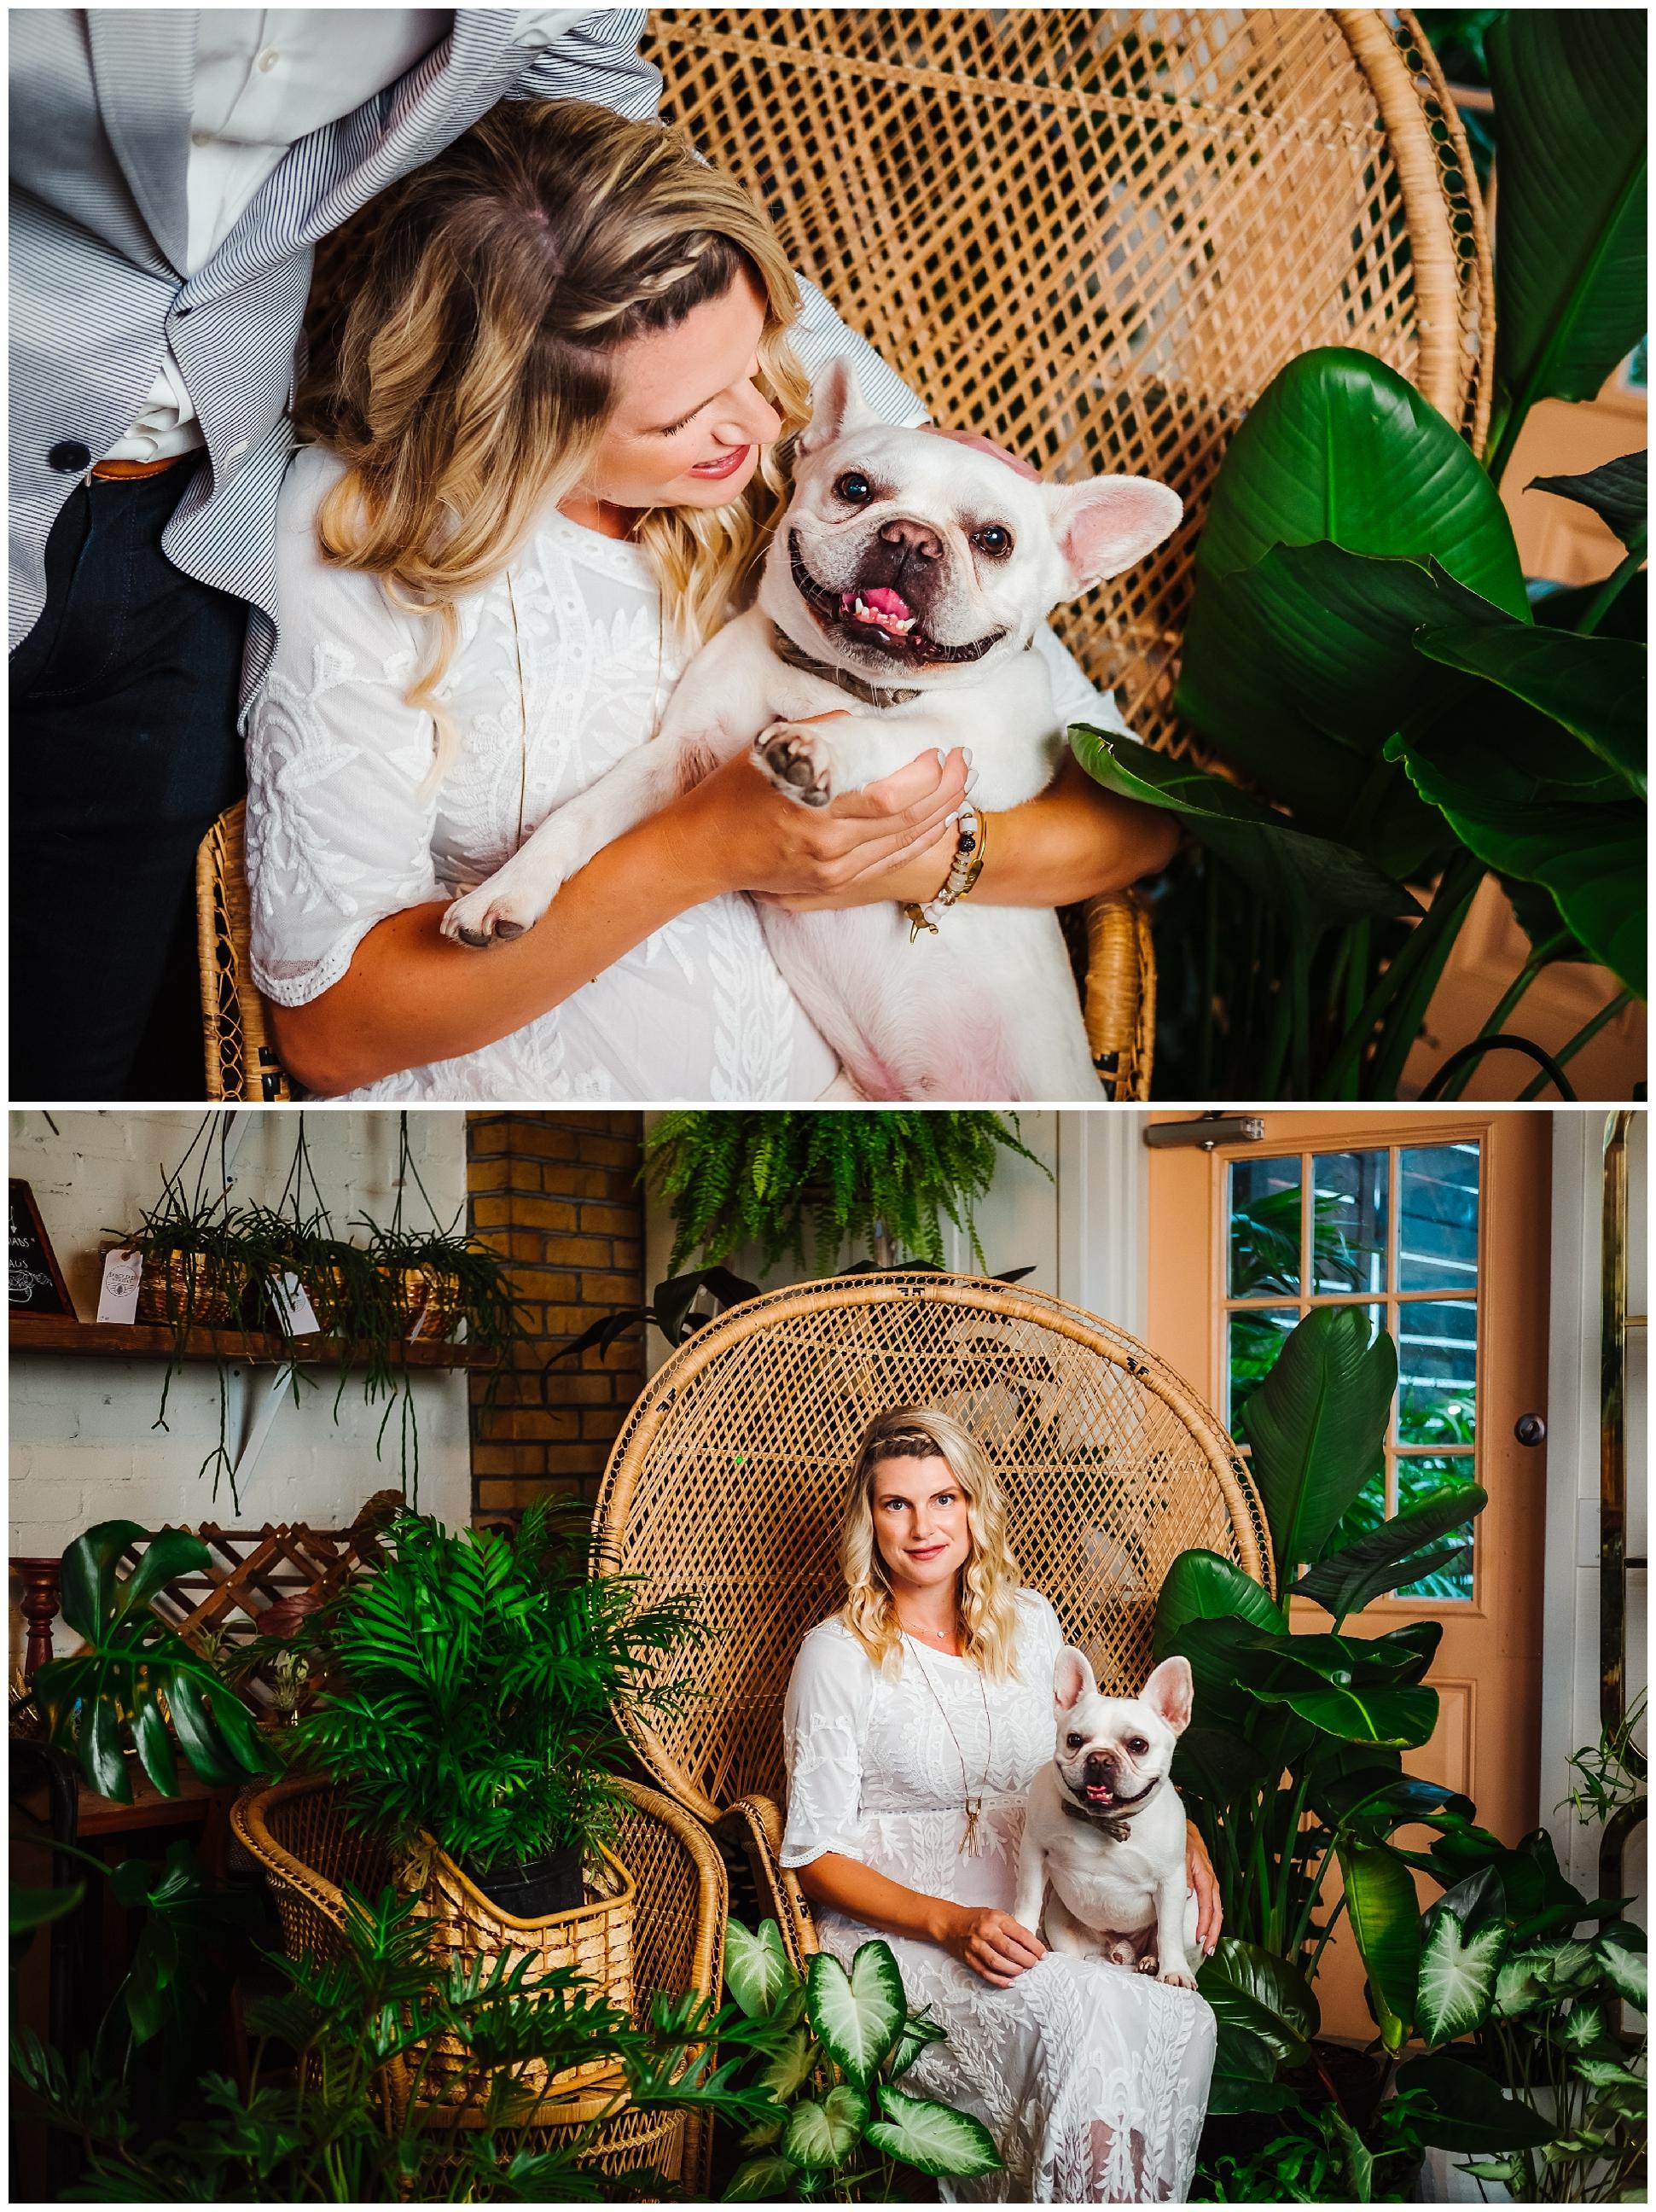 fancy-free-nursery-maternity-portraits-rainy-french-bulldog-boho-photographer-tampa_0037.jpg